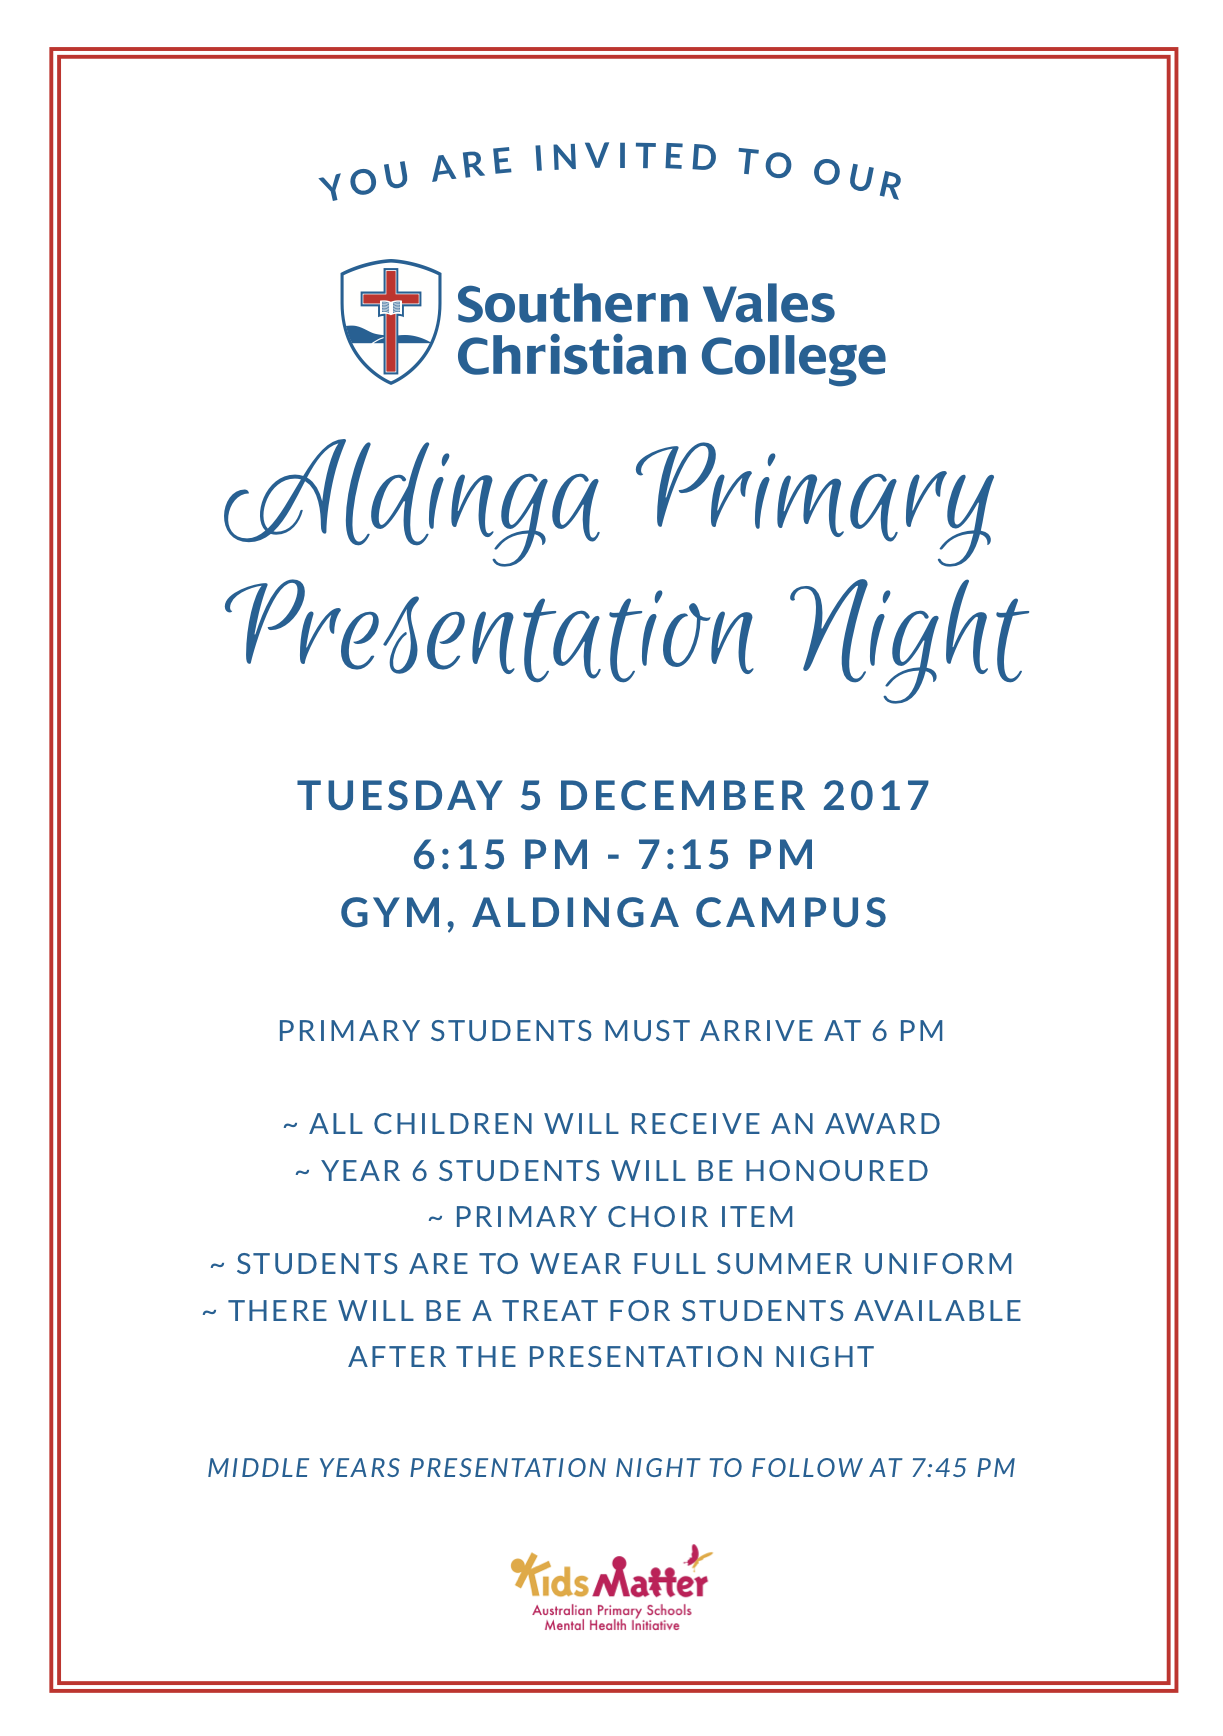 Primary Presentation Night Invitation ALD.png